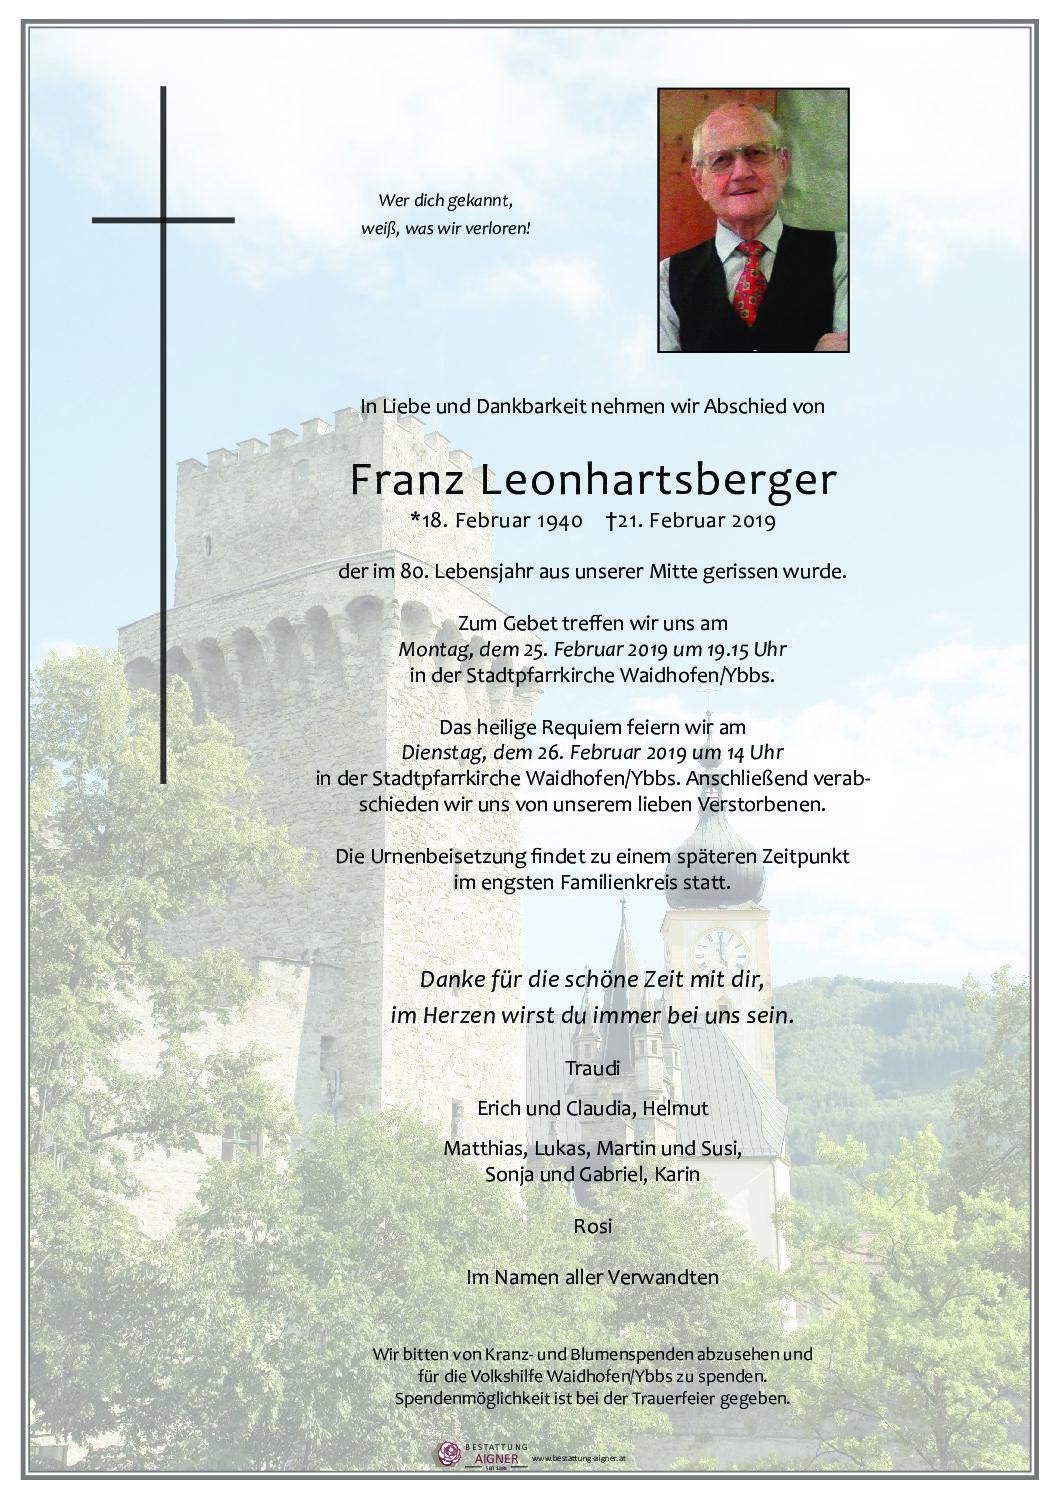 Franz Leonhartsberger